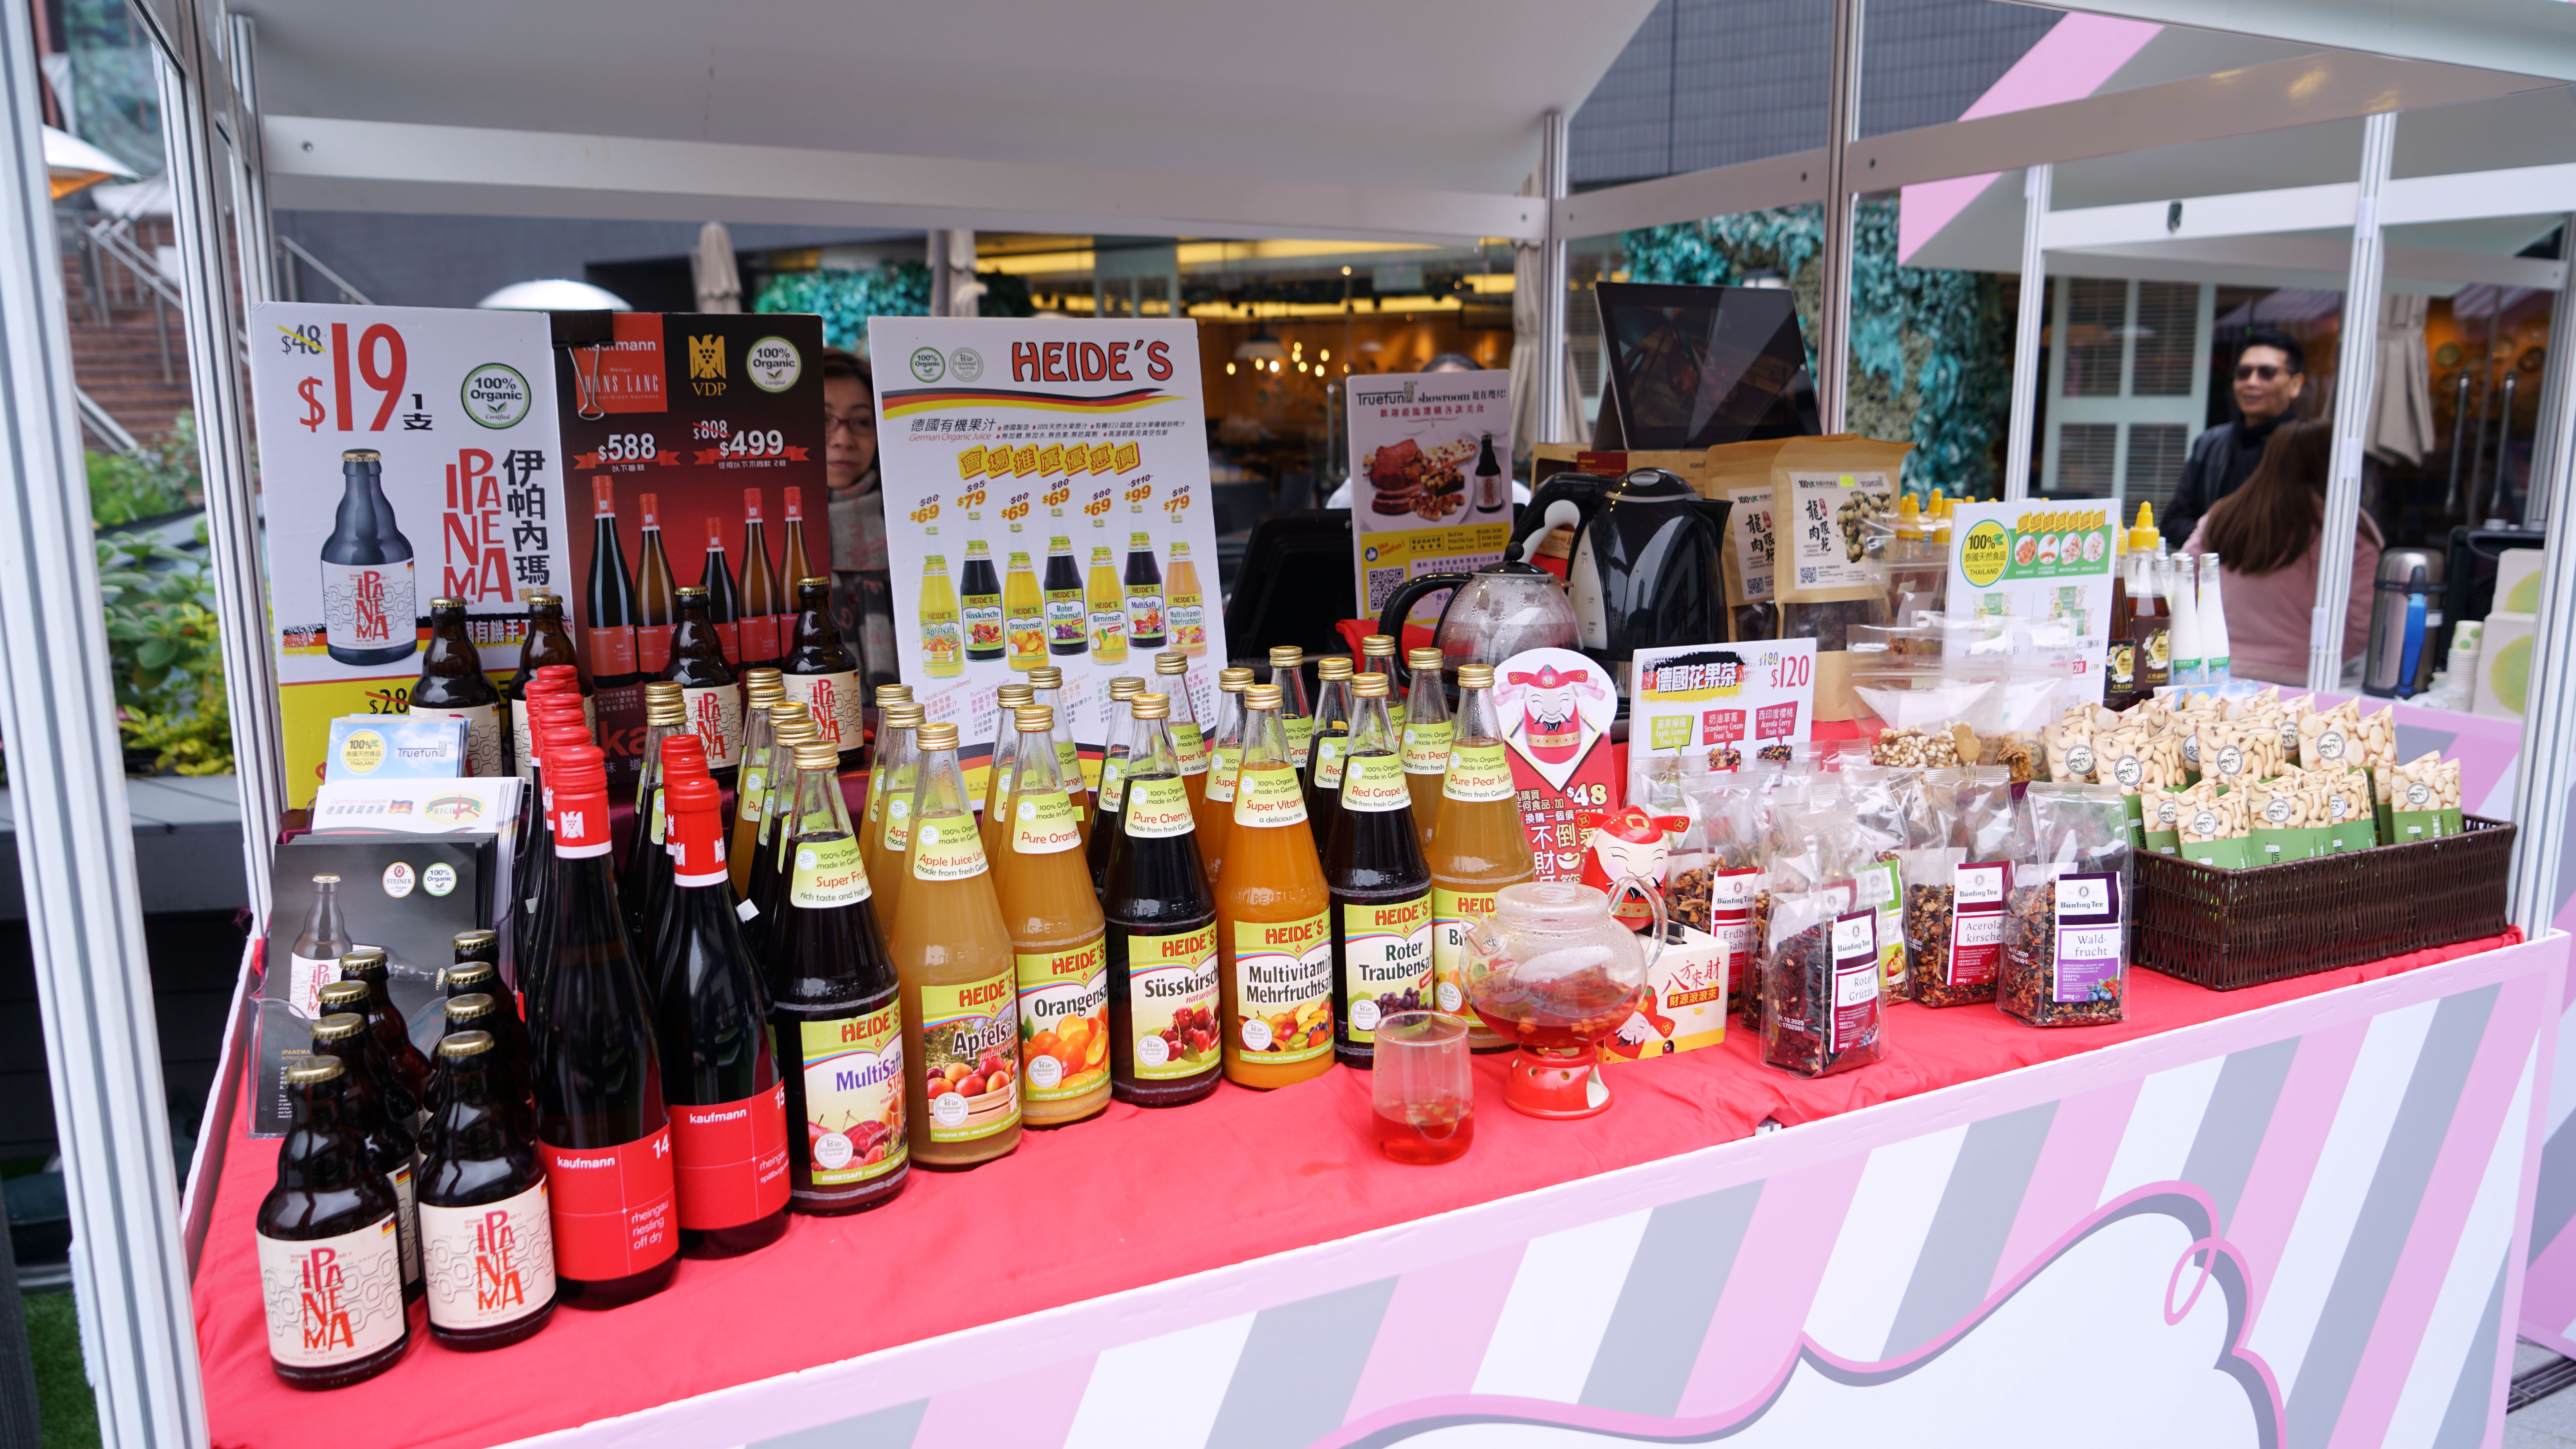 Truefun帶來德國有機手工啤酒,採用阿爾卑斯山的雪水、有機麥芽及啤酒花精心釀造,過程不經過濾或高溫處理,味道清新而帶有濃郁果香及酒花香。同場亦有Kaufmann Riesling 甜酒,讓你一邊喝甜酒,一邊賞花,帶來幸福快樂的感覺。